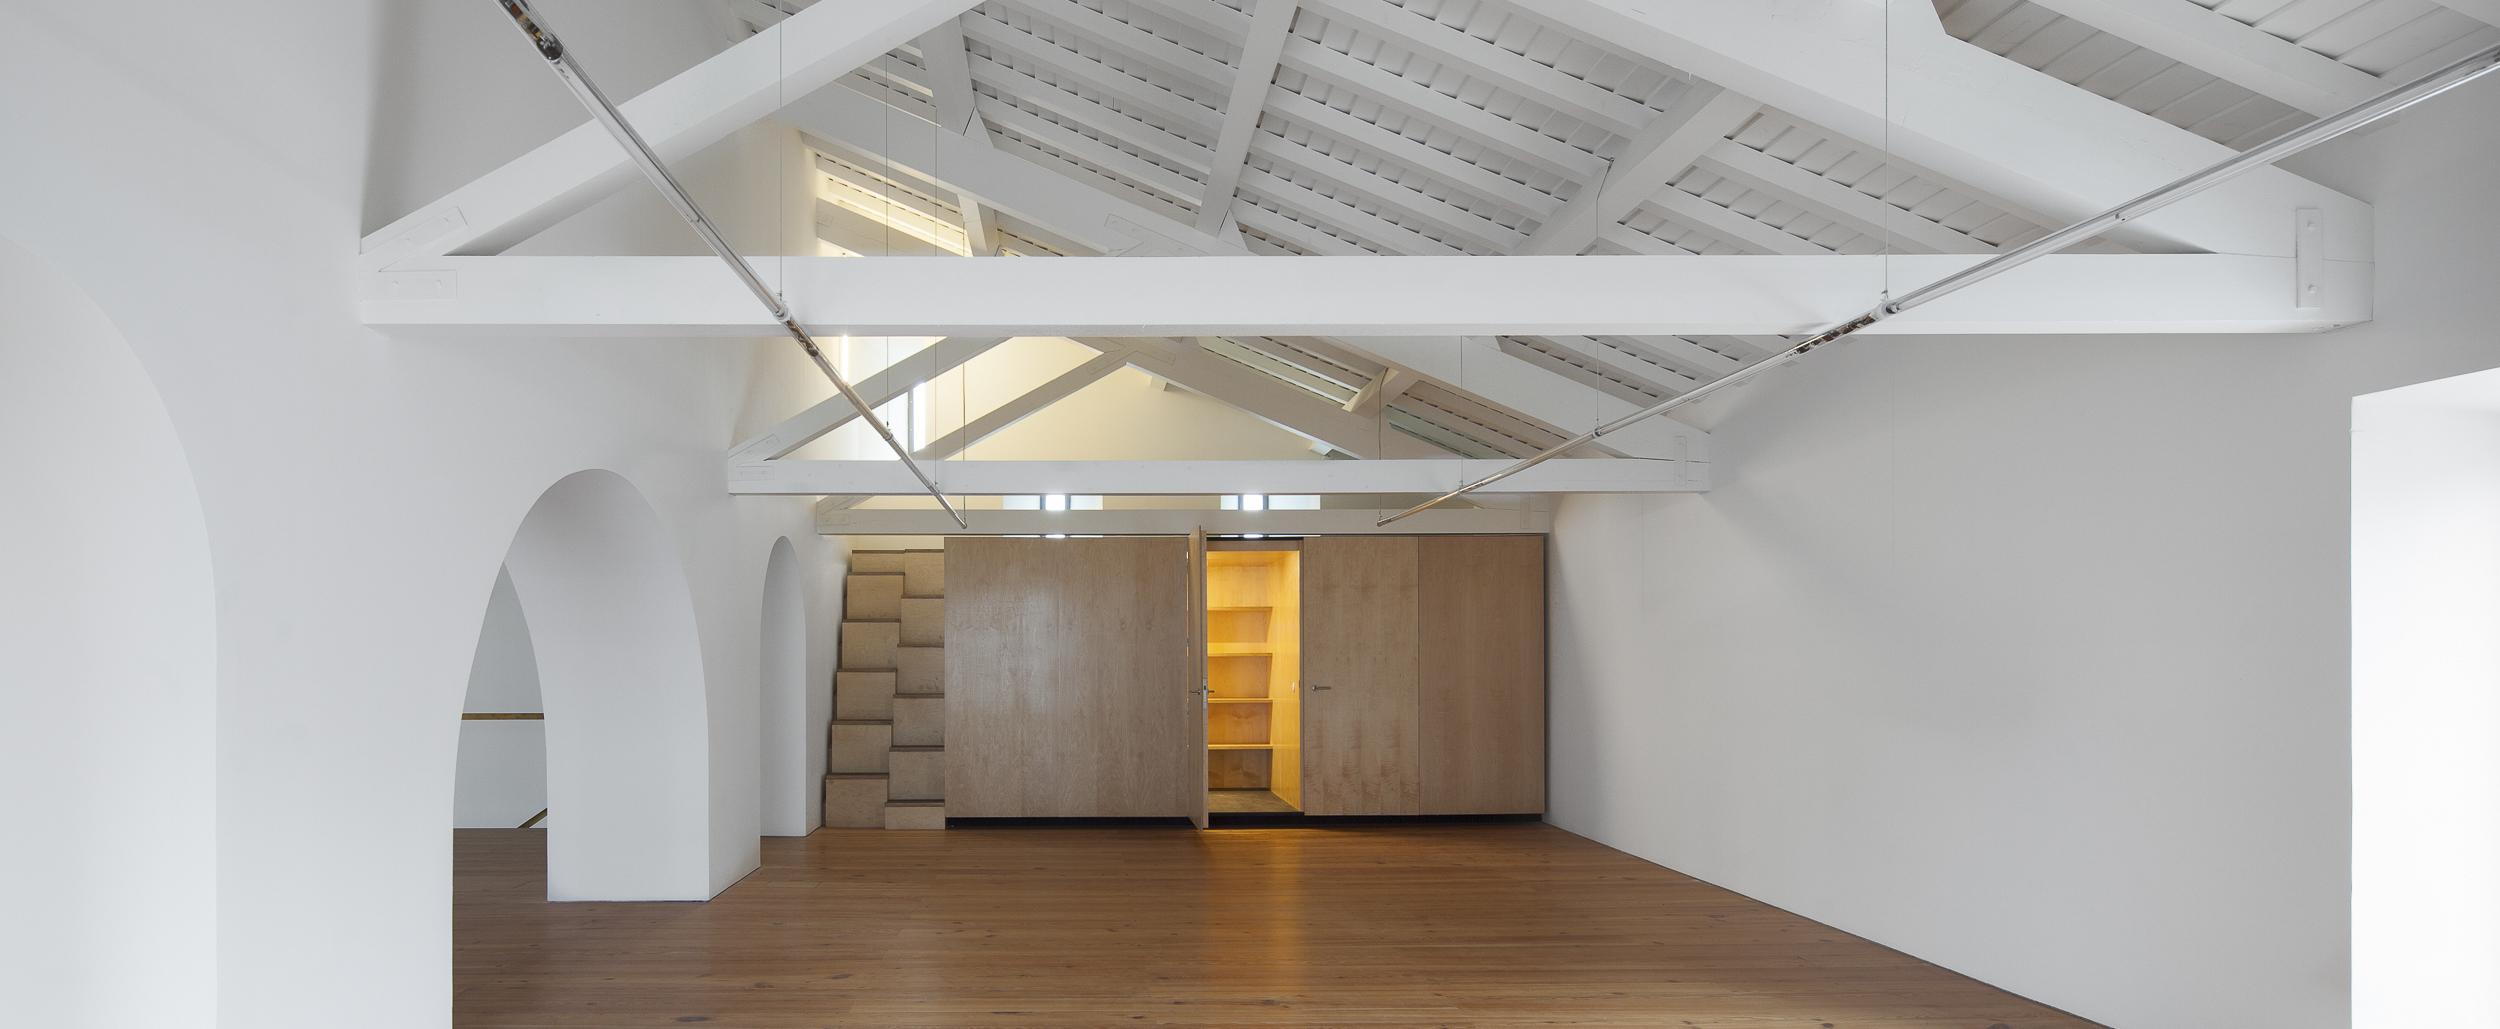 contemporary_arts_center_interior.jpg